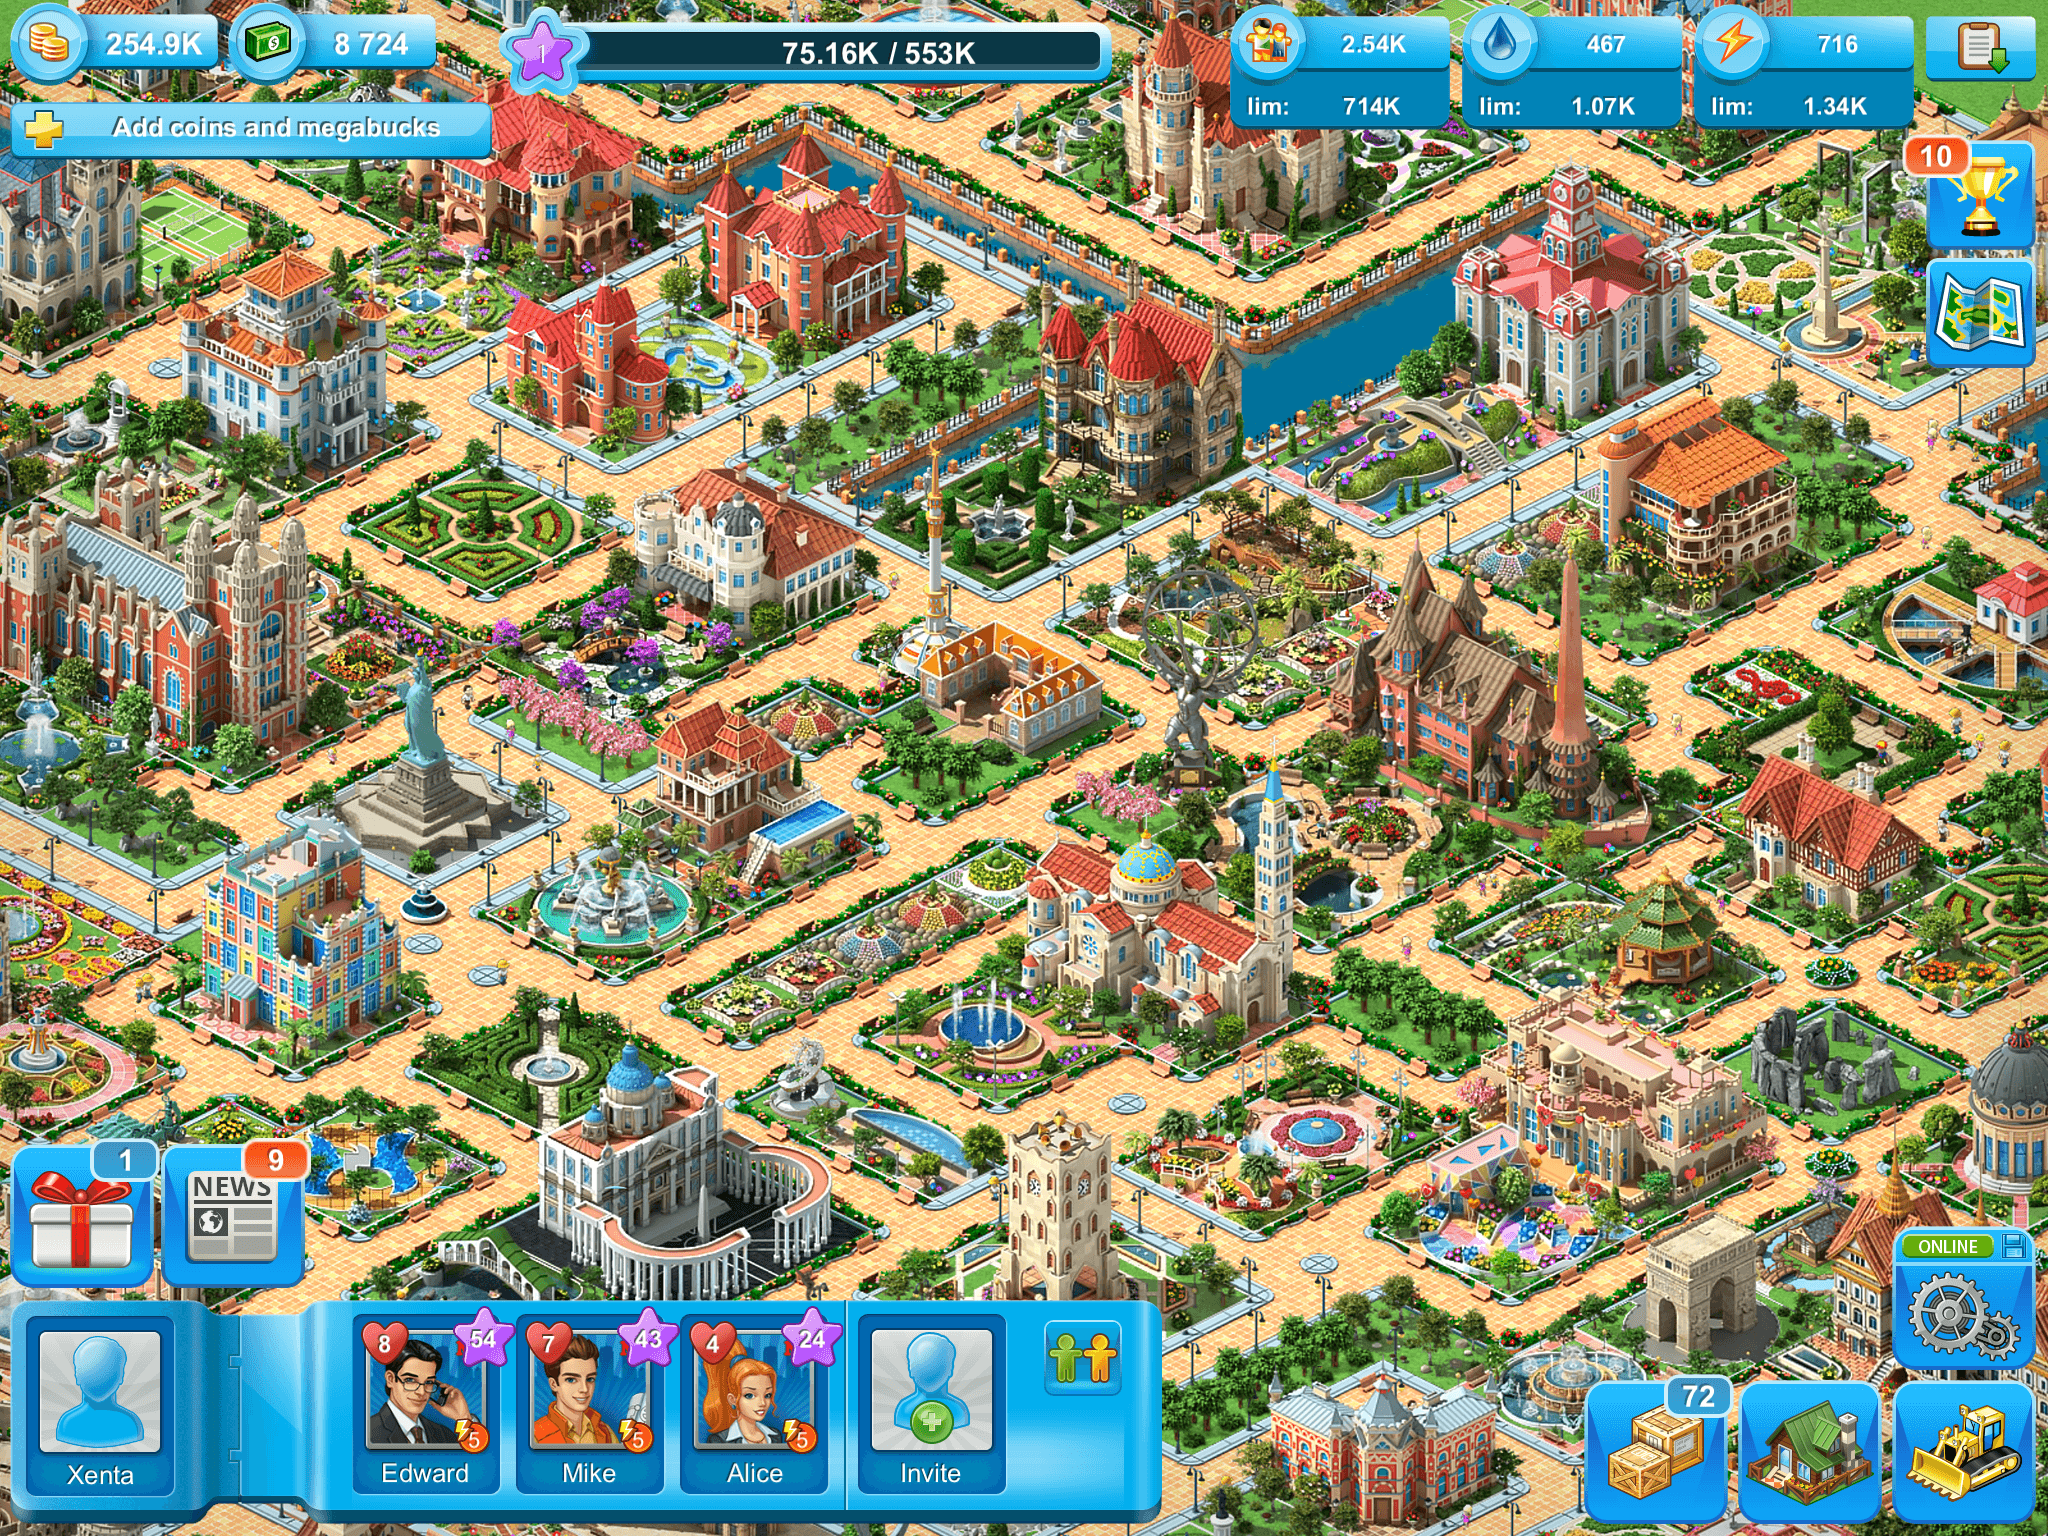 картинки игры город мегаполис человека